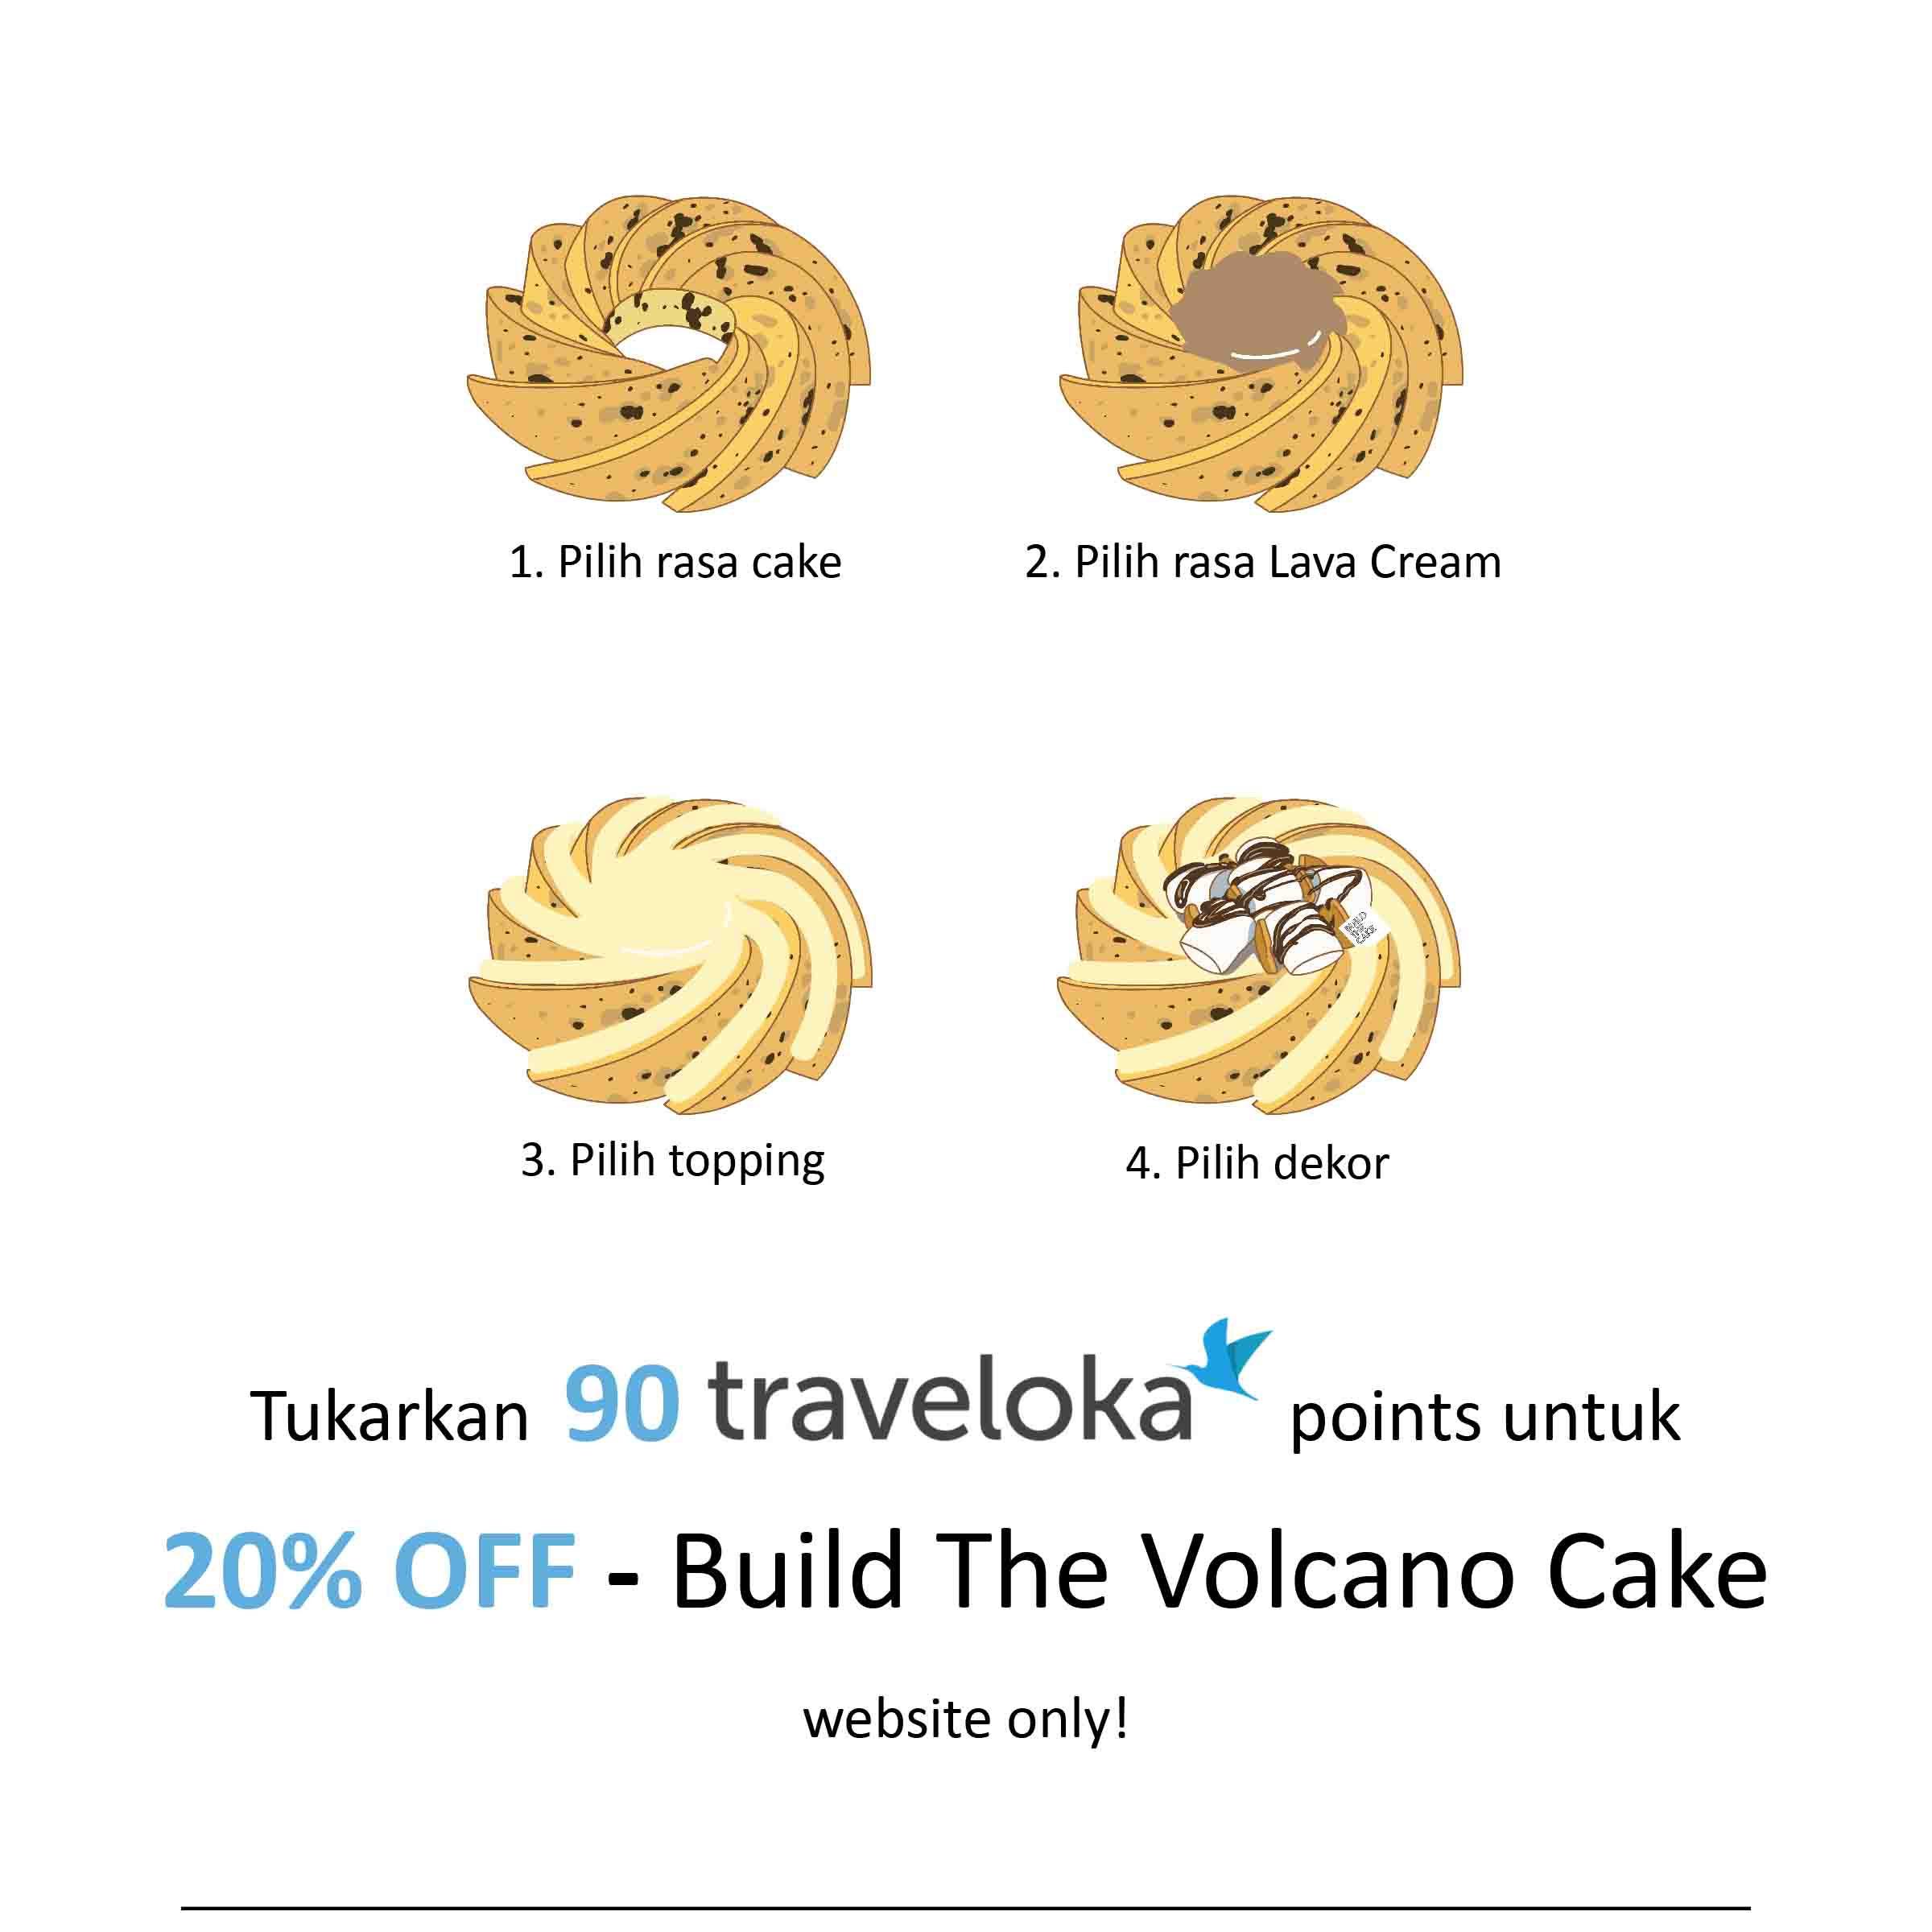 Build The Volcano Cake